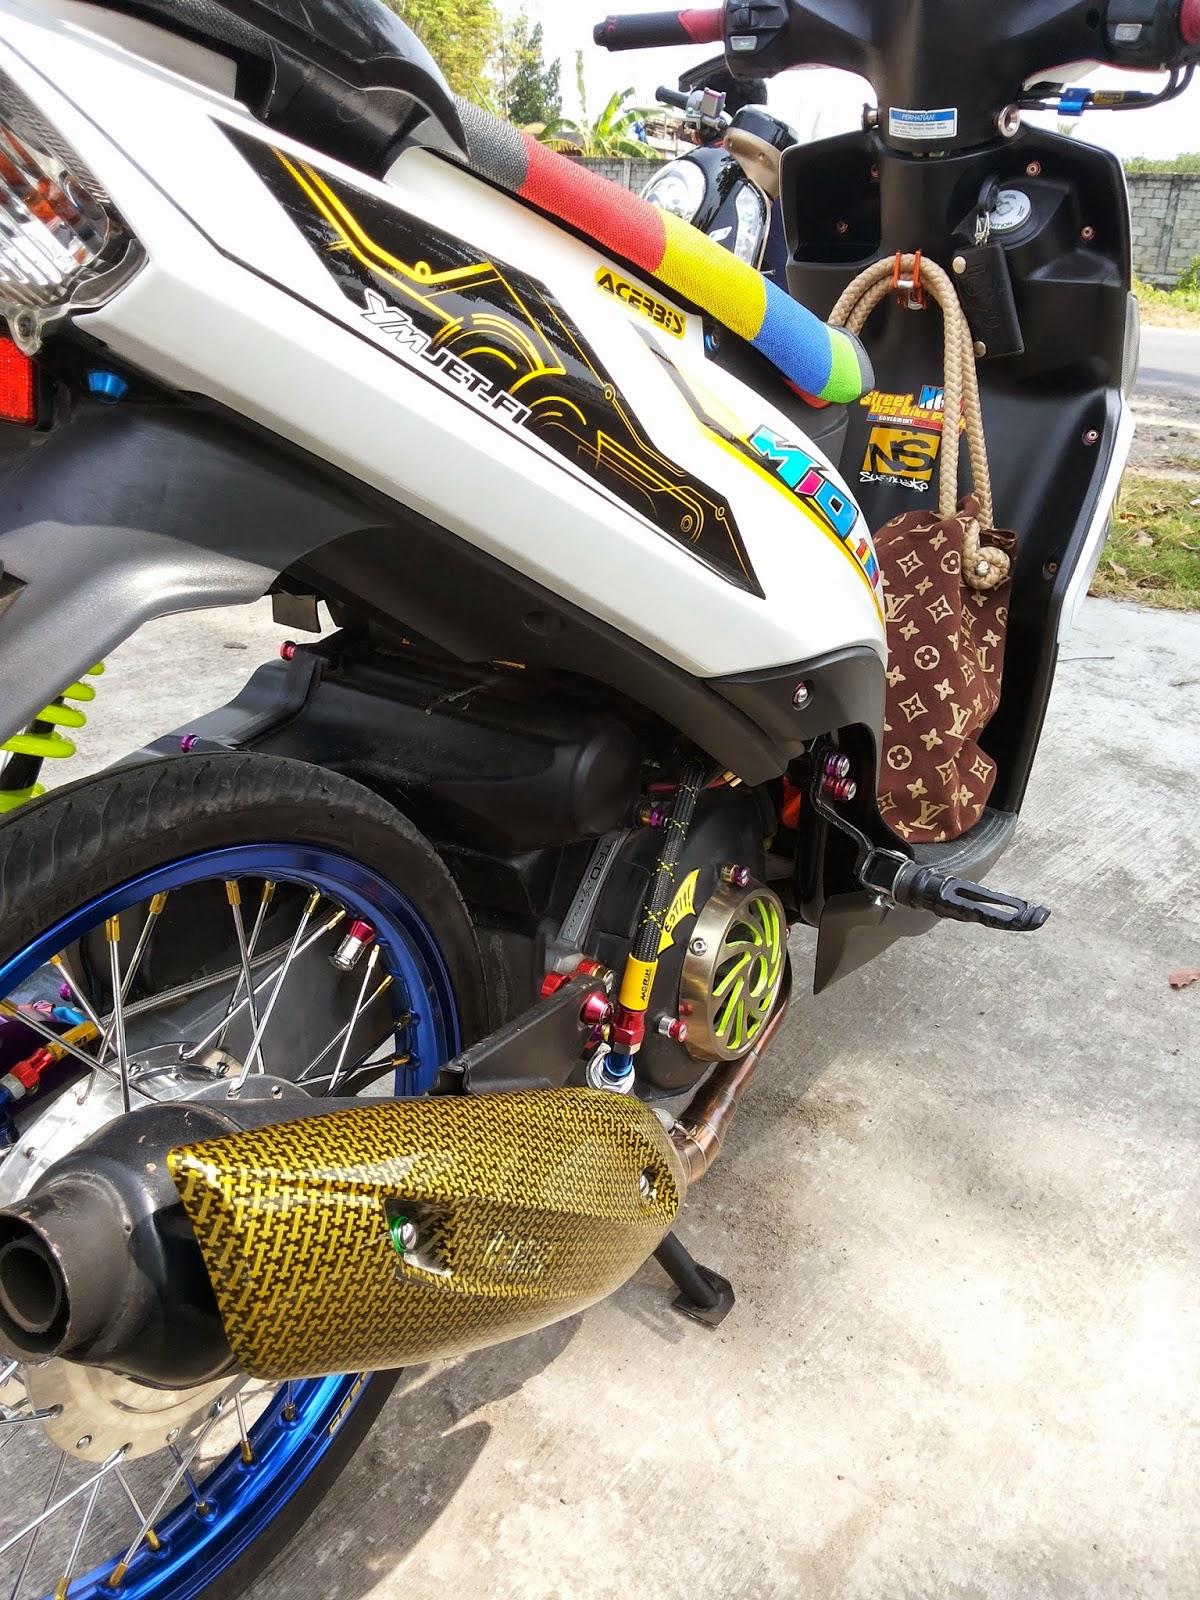 Kumpulan Foto Modifikasi Motor Thailand Terlengkap Modispik Motor